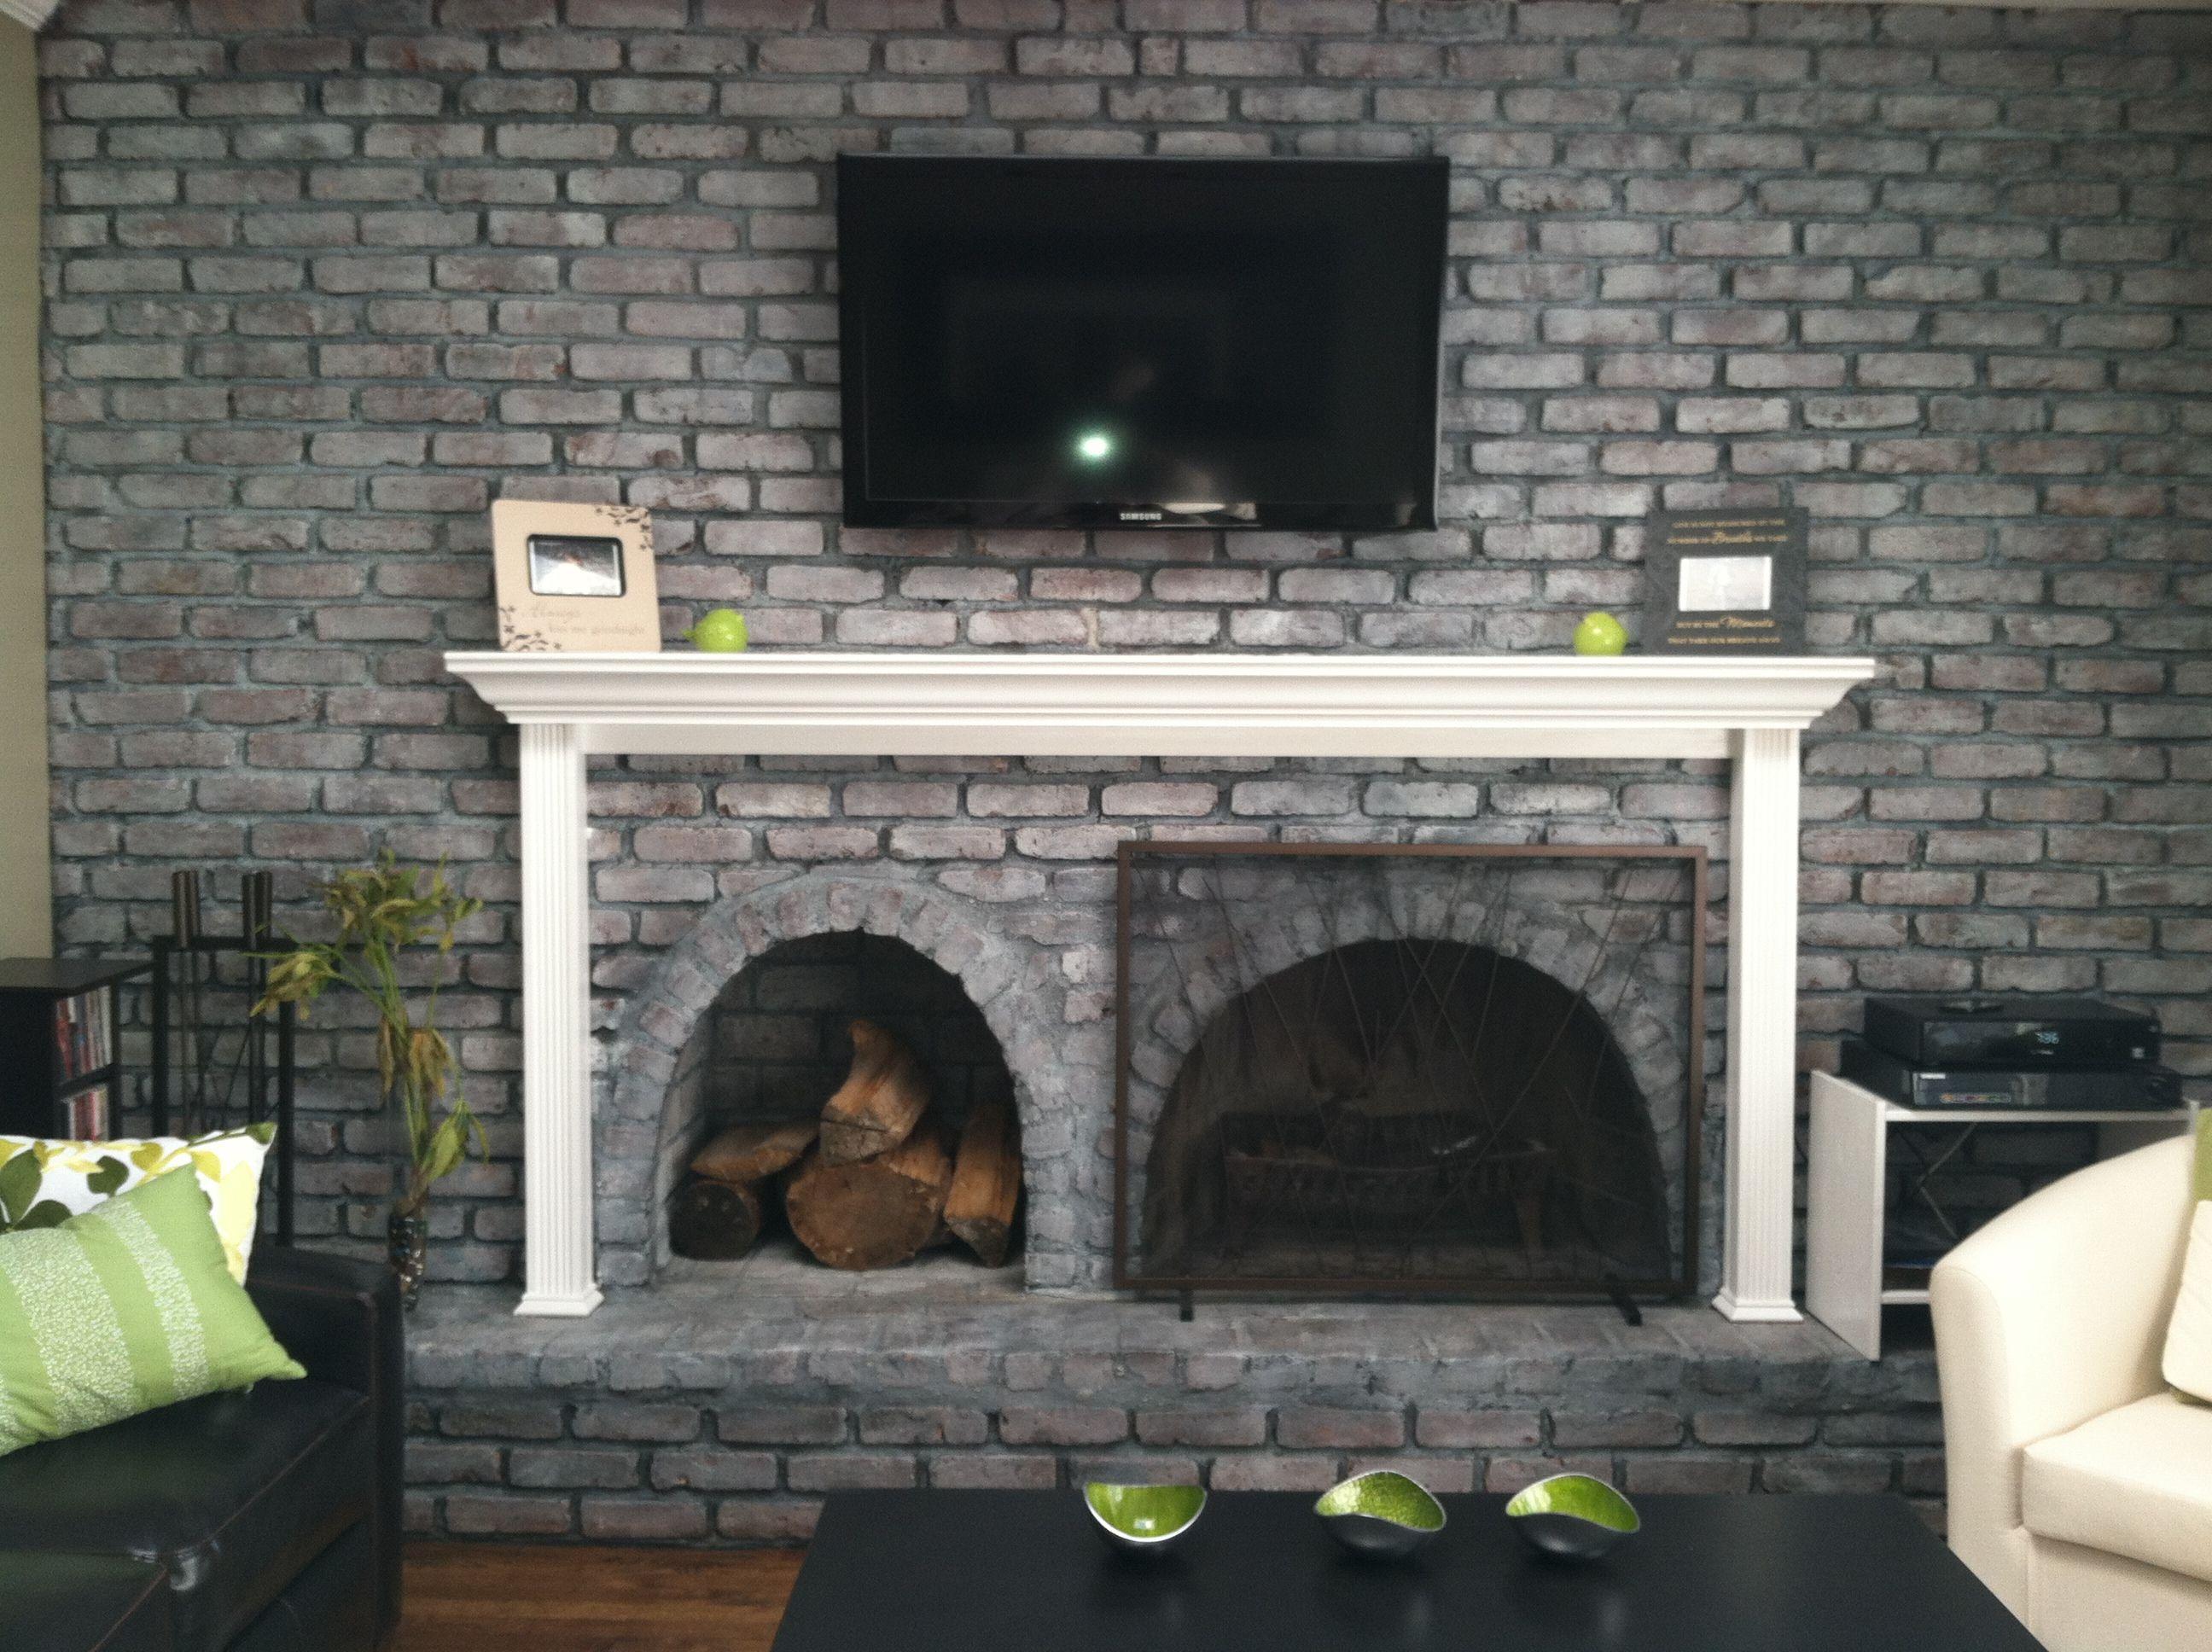 Brick Fireplace 1 Pint Benjamin Moore